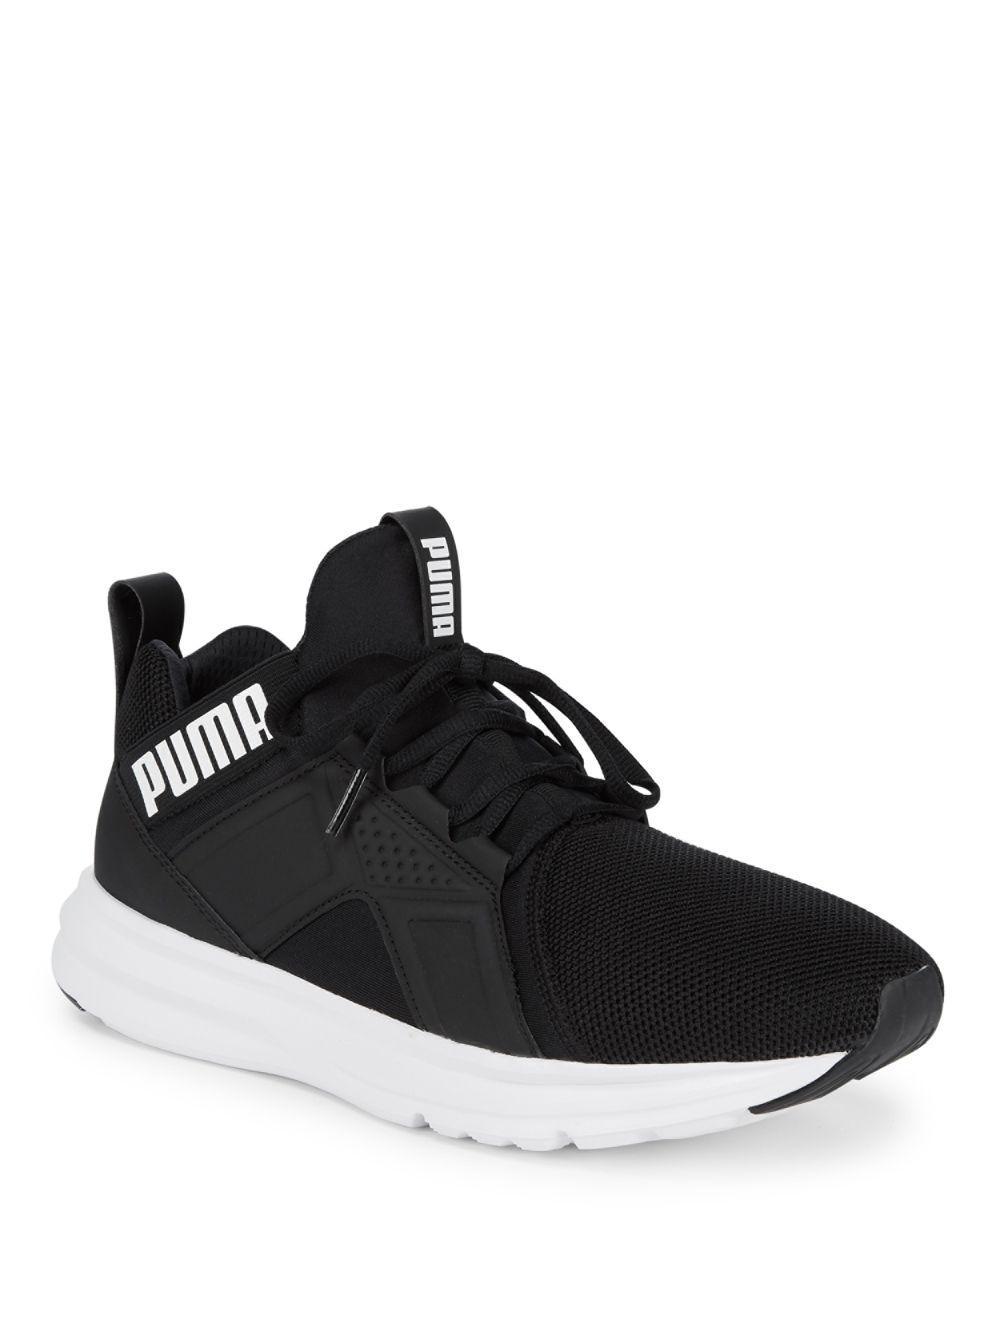 b3ad07ad143e9a PUMA - Black Mesh Lace-up Sneakers for Men - Lyst. View fullscreen